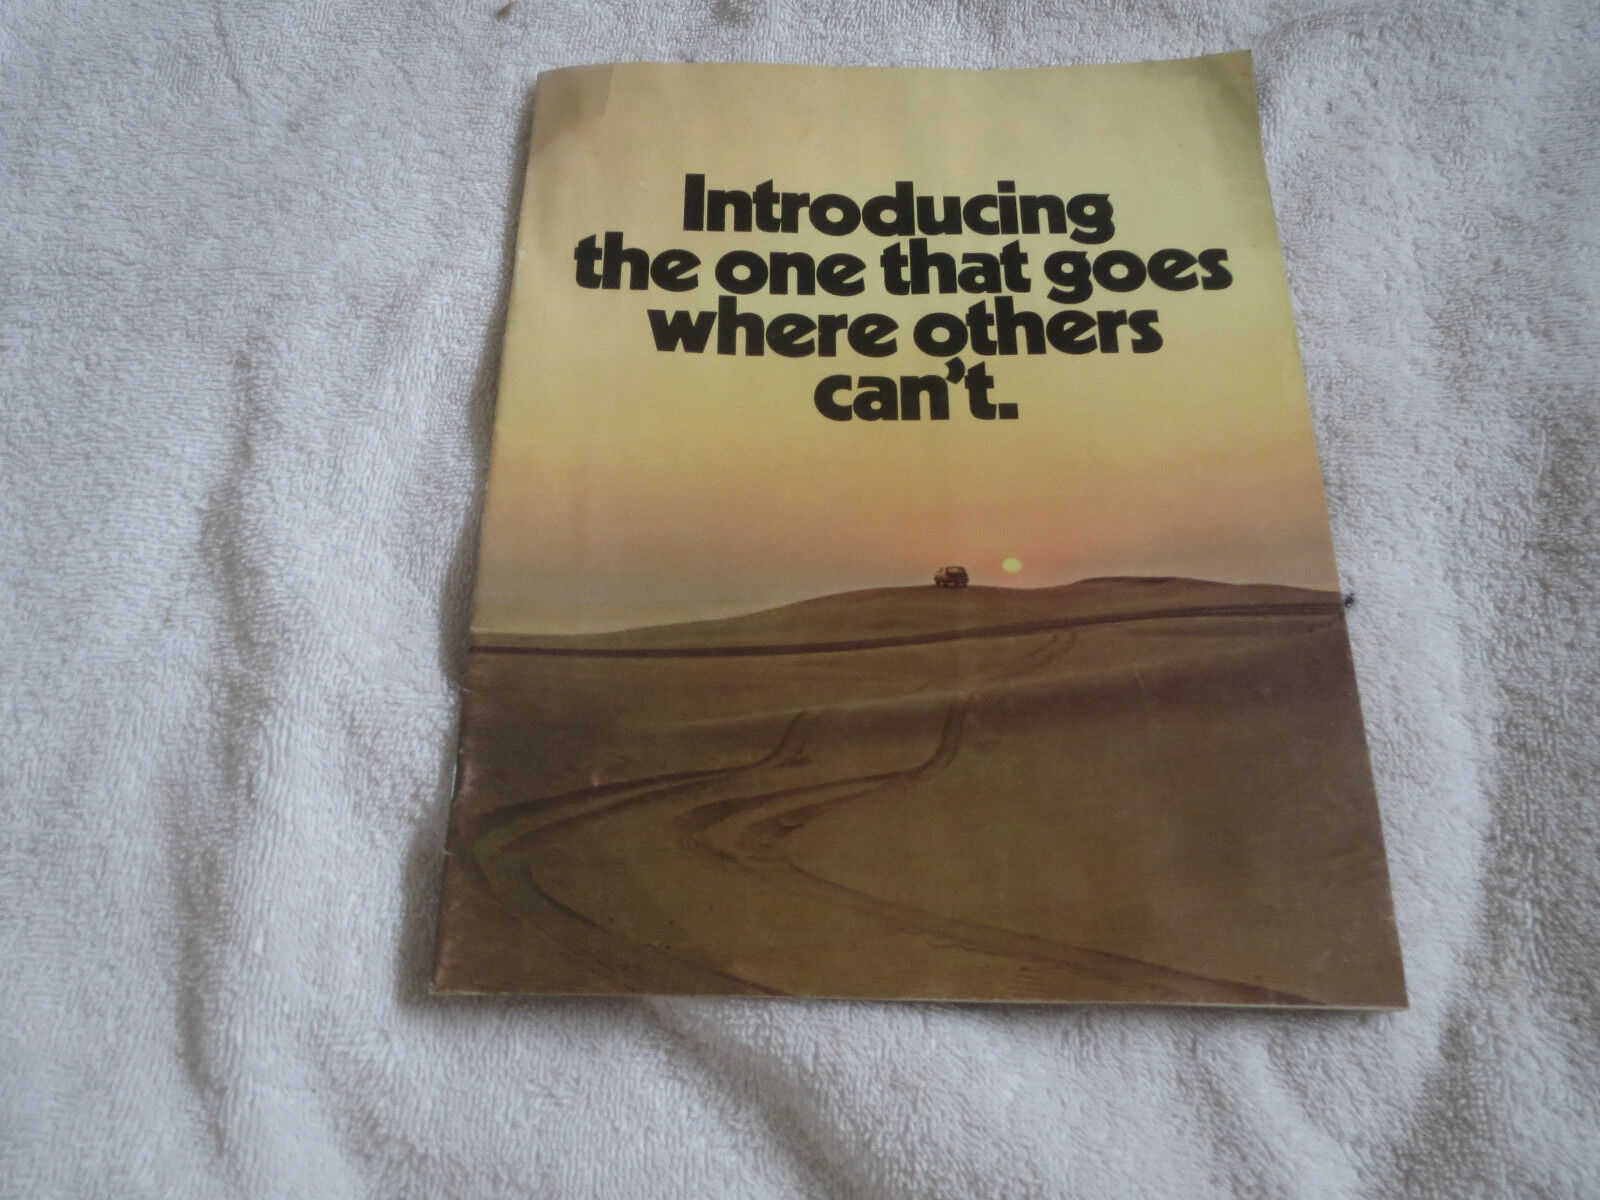 1971 JEEP CHEROKEE PICKUPS CJ5 CJ6 WAGONEER ORIGINAL DEALER SALES BROCHURE